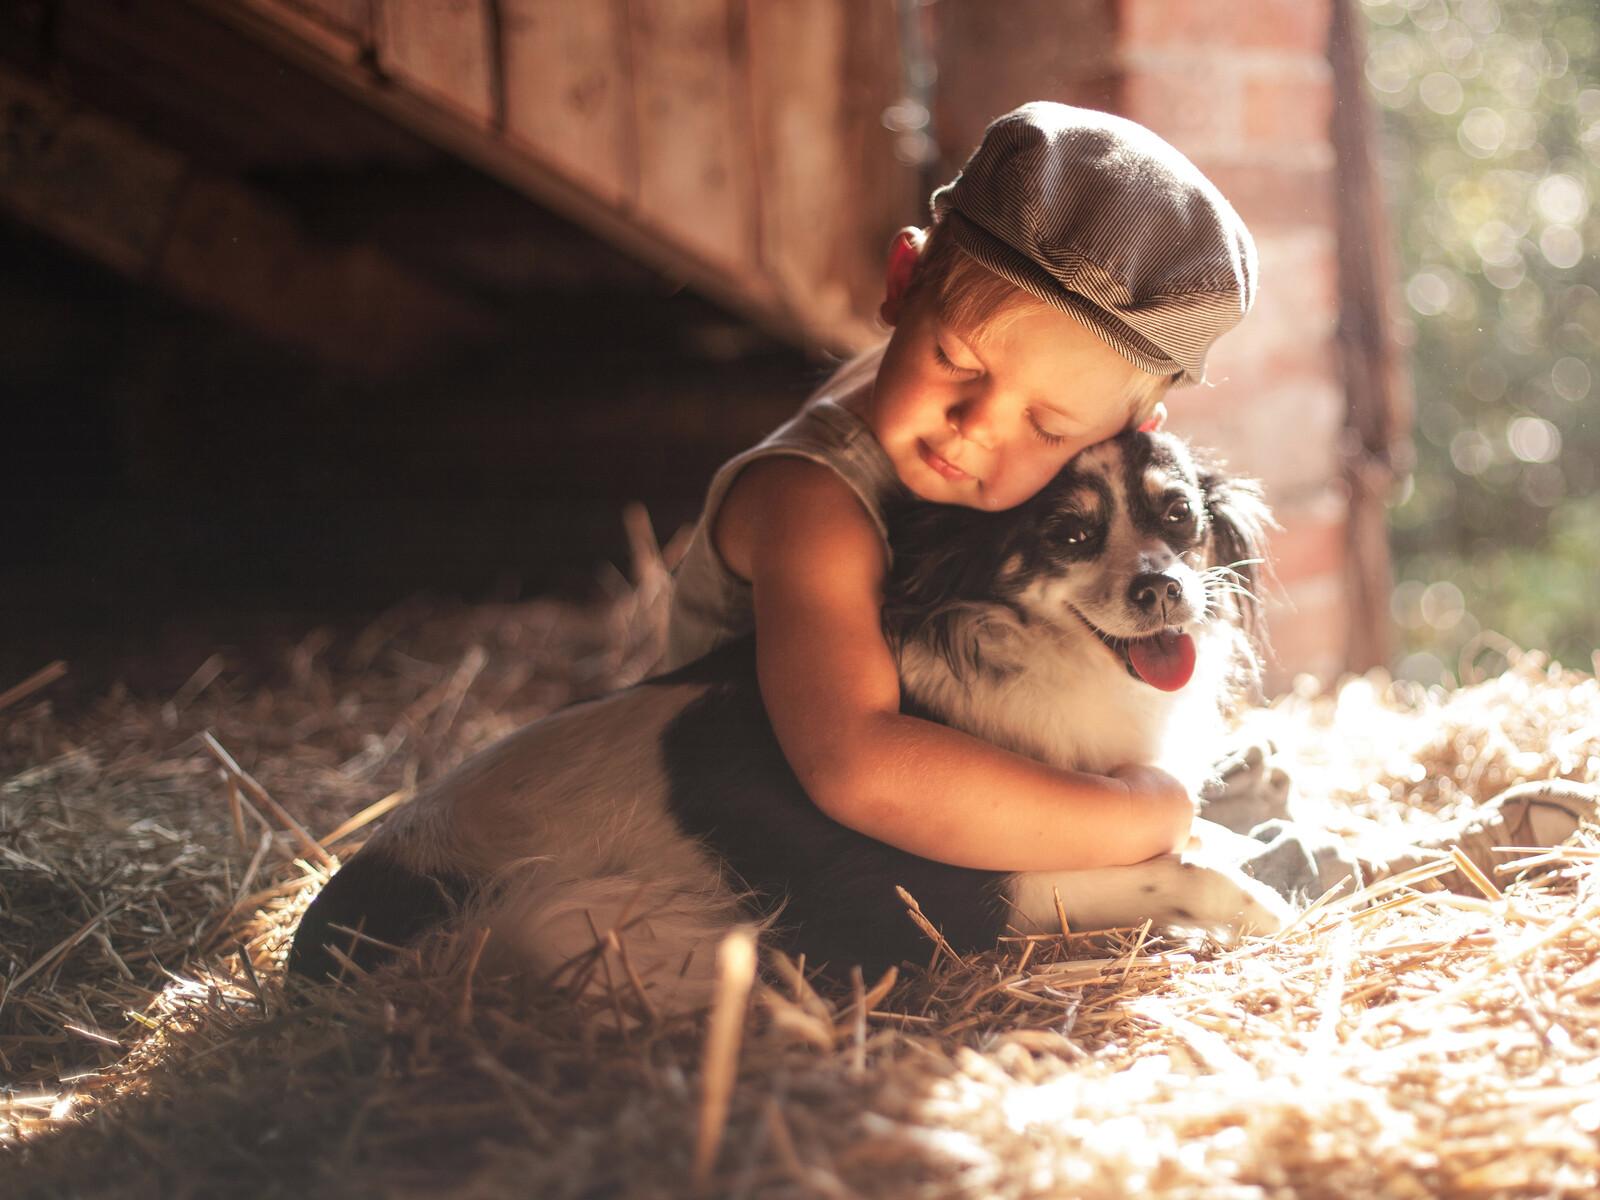 boy-outdoors-hugging-dog-5k-5u.jpg